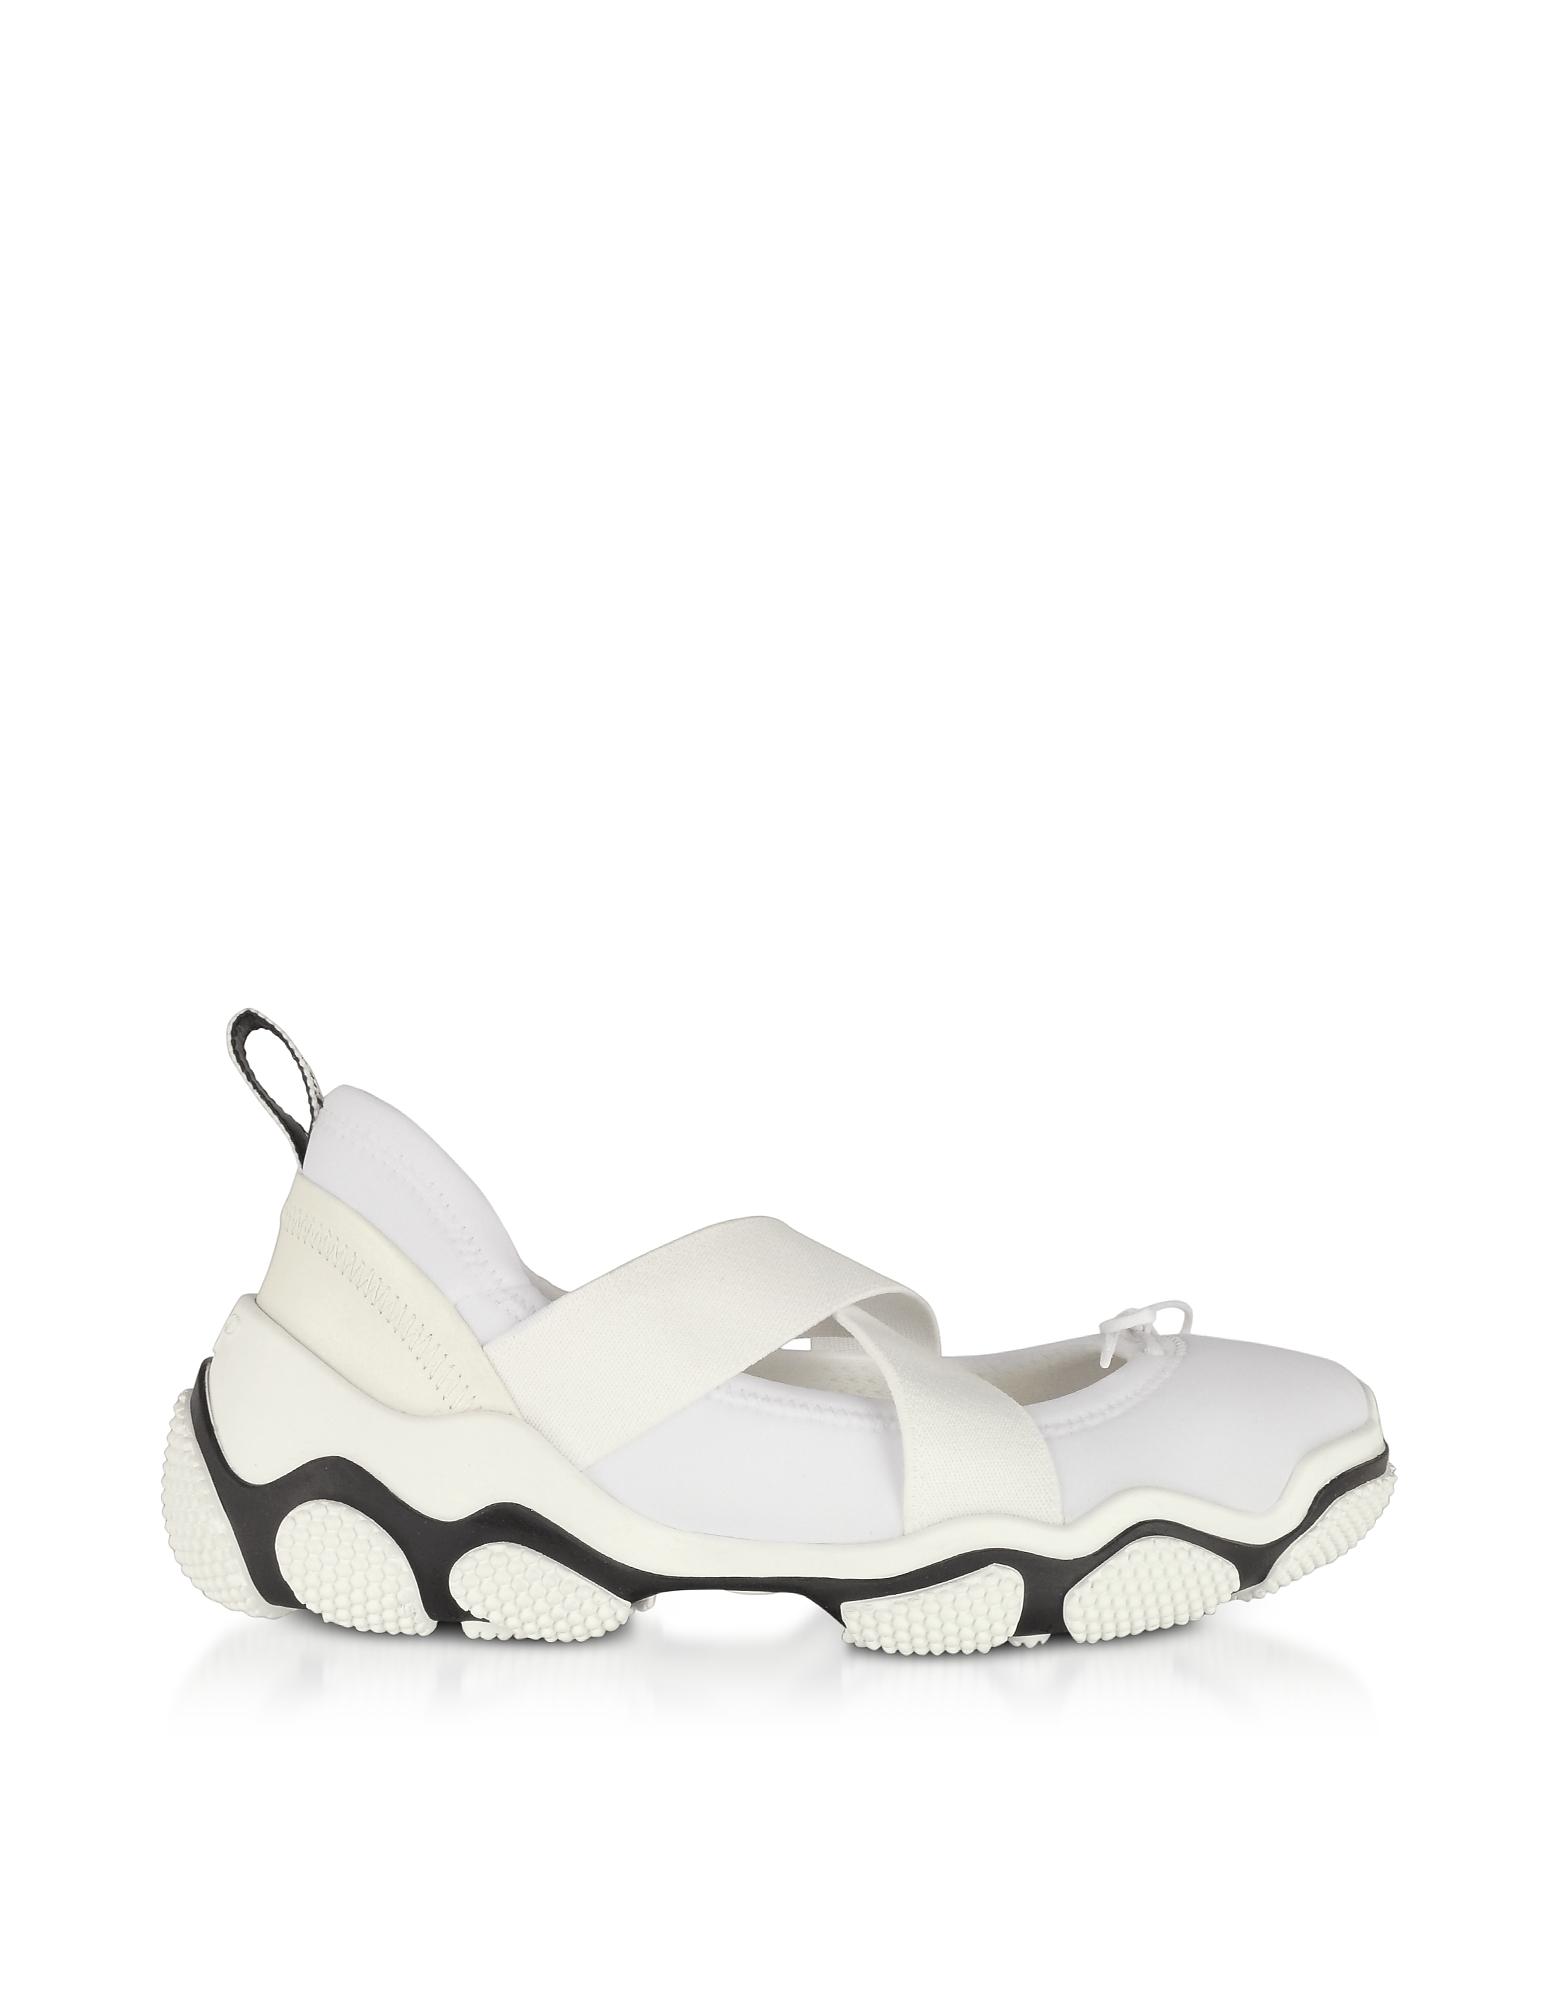 Pure White Nylon Criss Cross Sneakers